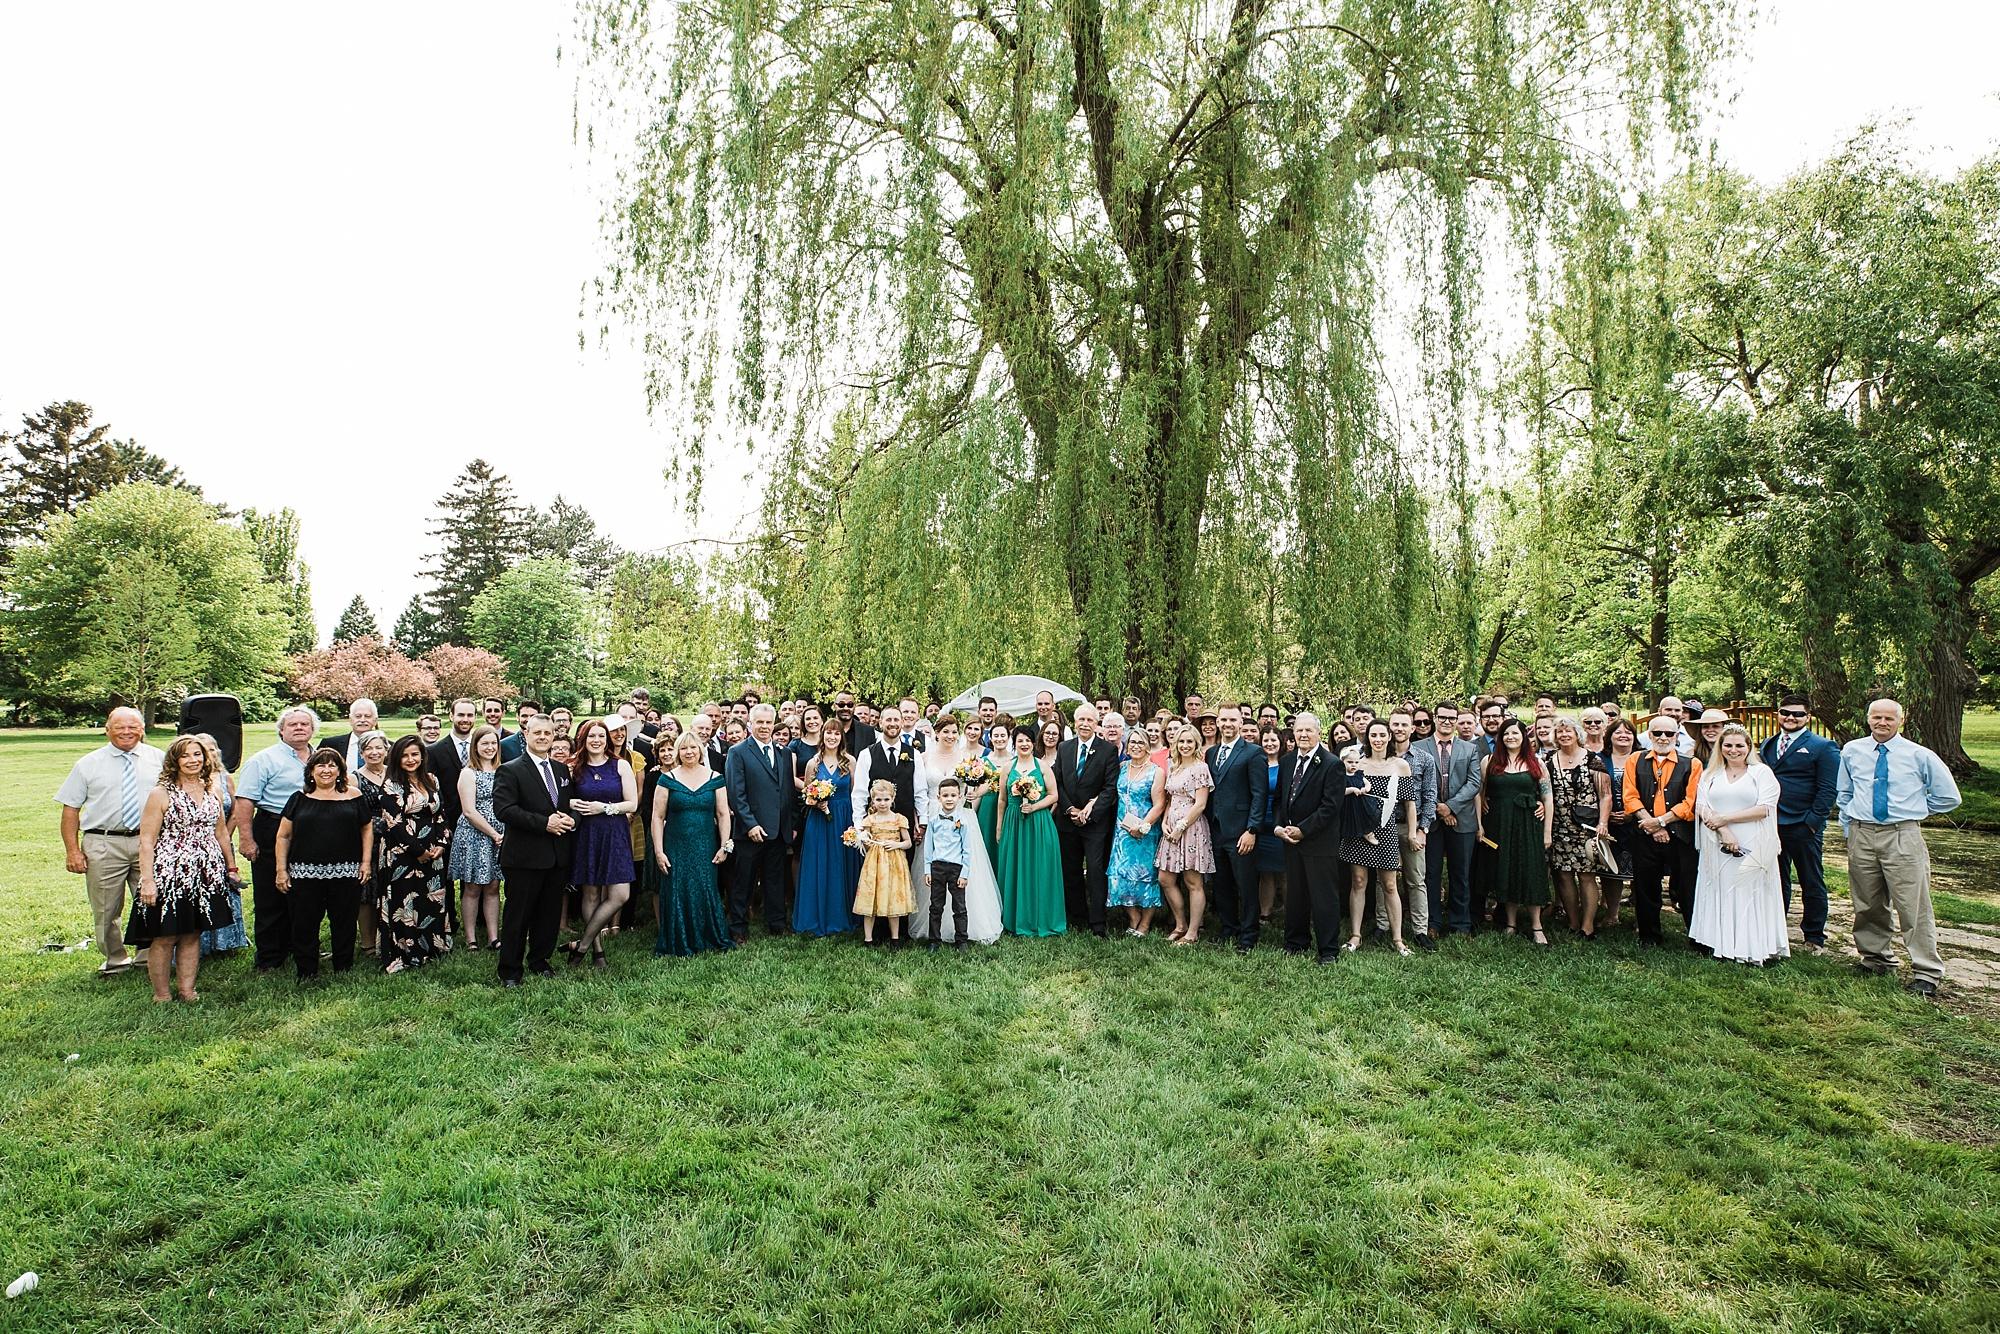 niagarafalls-weddingphotography_0024.jpg